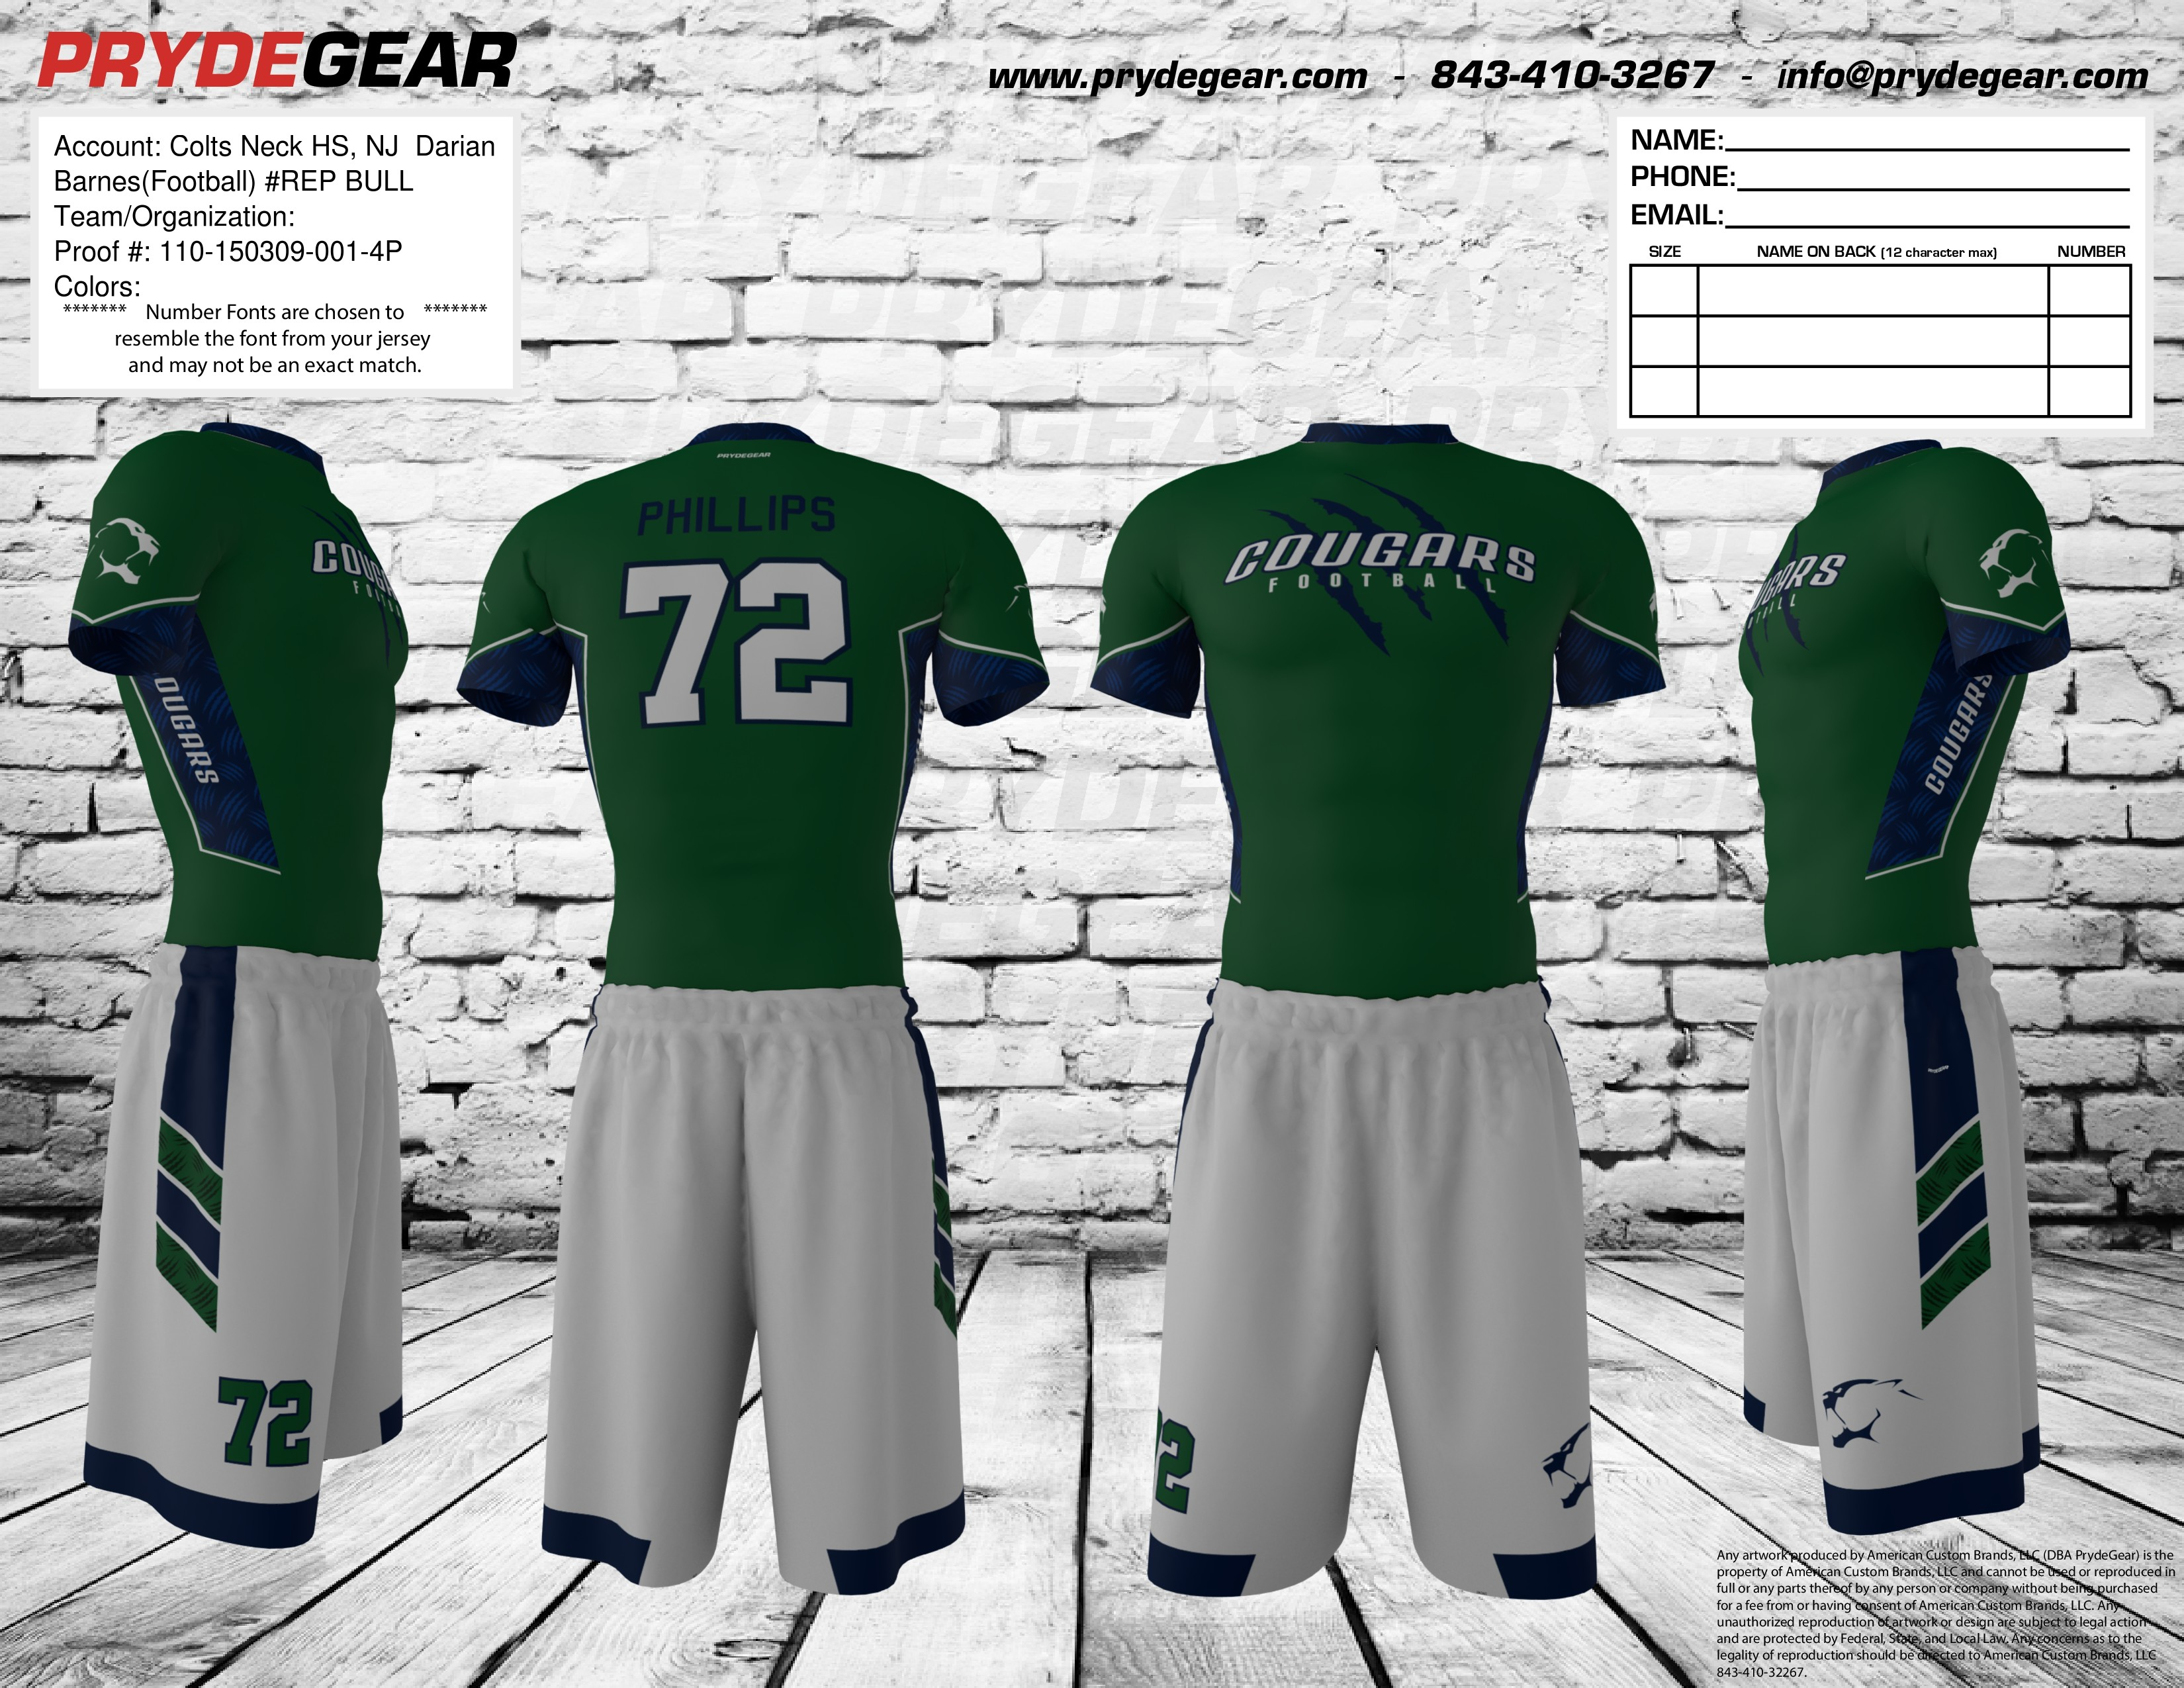 28efaf253 Pryde Gear (7 on 7) – Colts Neck High School Football